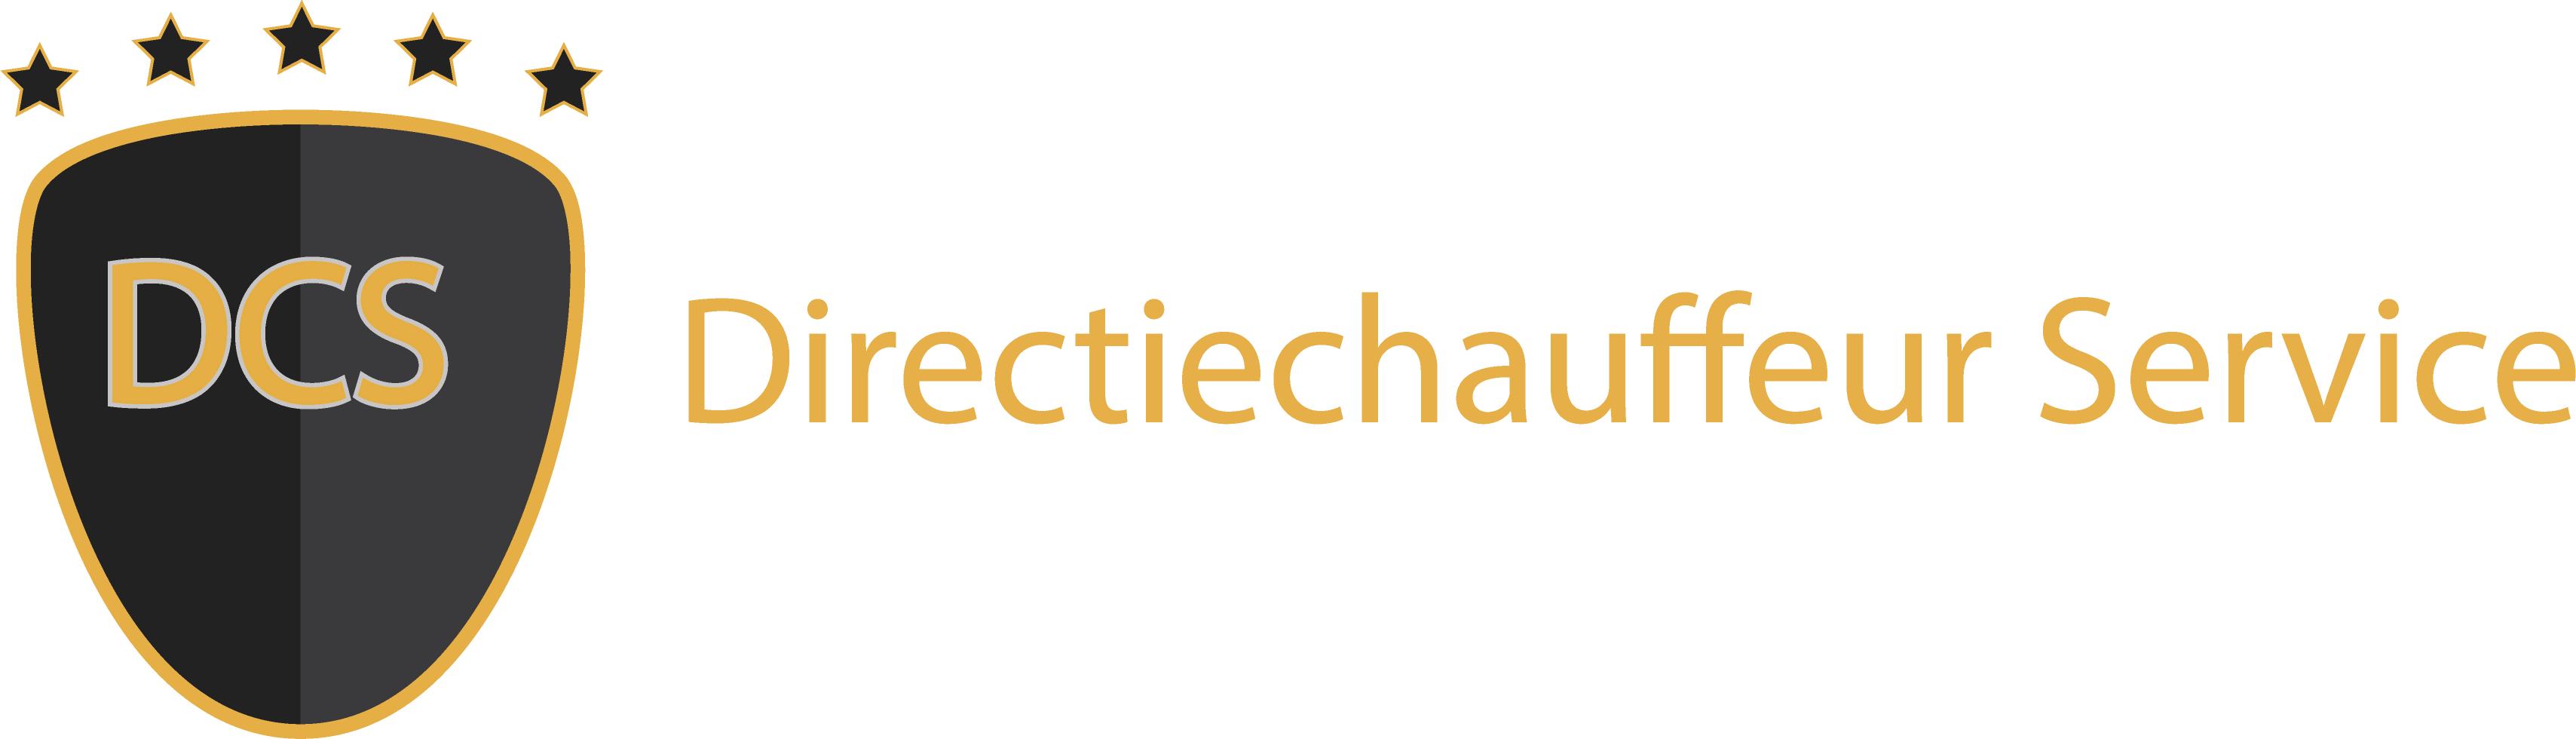 Directiechauffeur Service Logo2